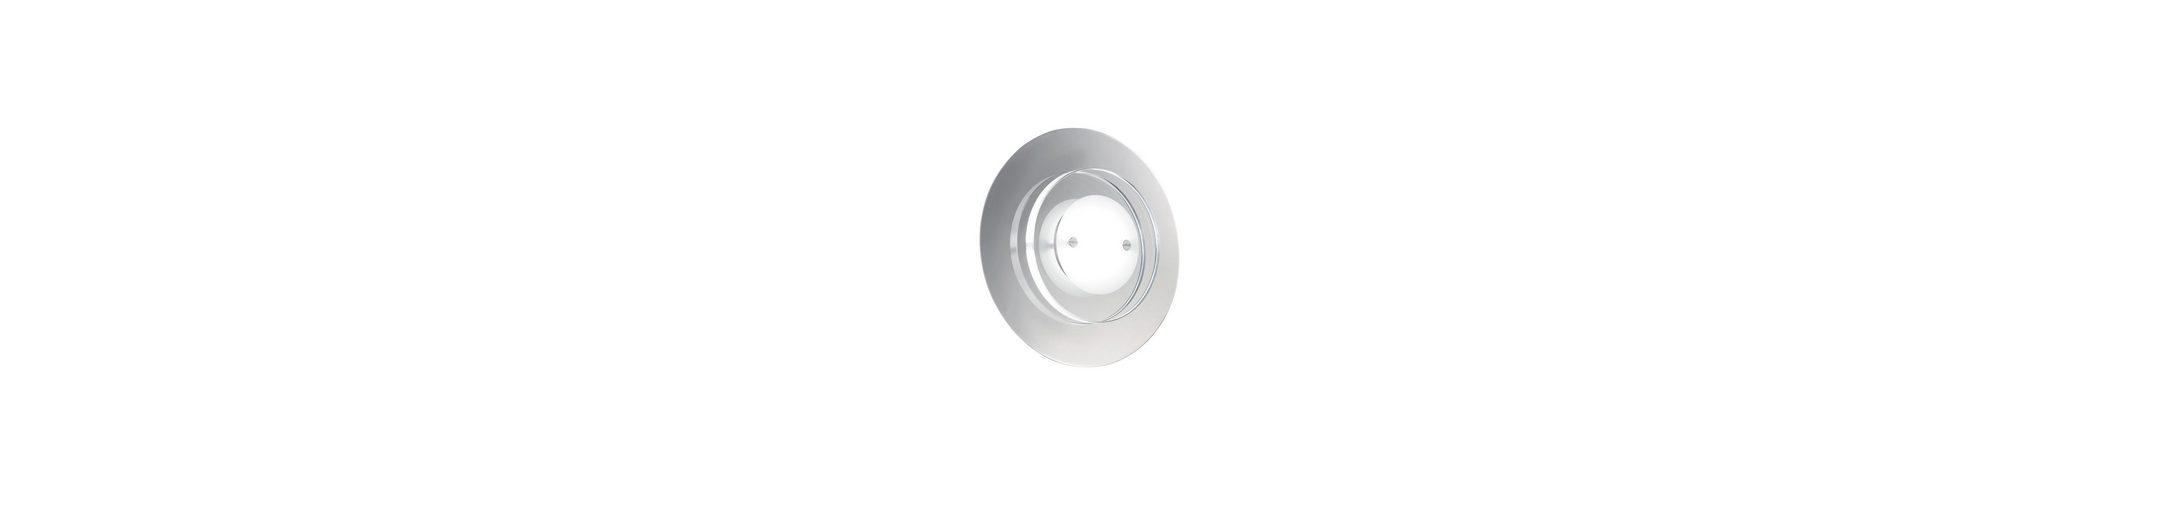 Trio LED-Wandleuchte, 1flg., inkl. OSRAM-LED